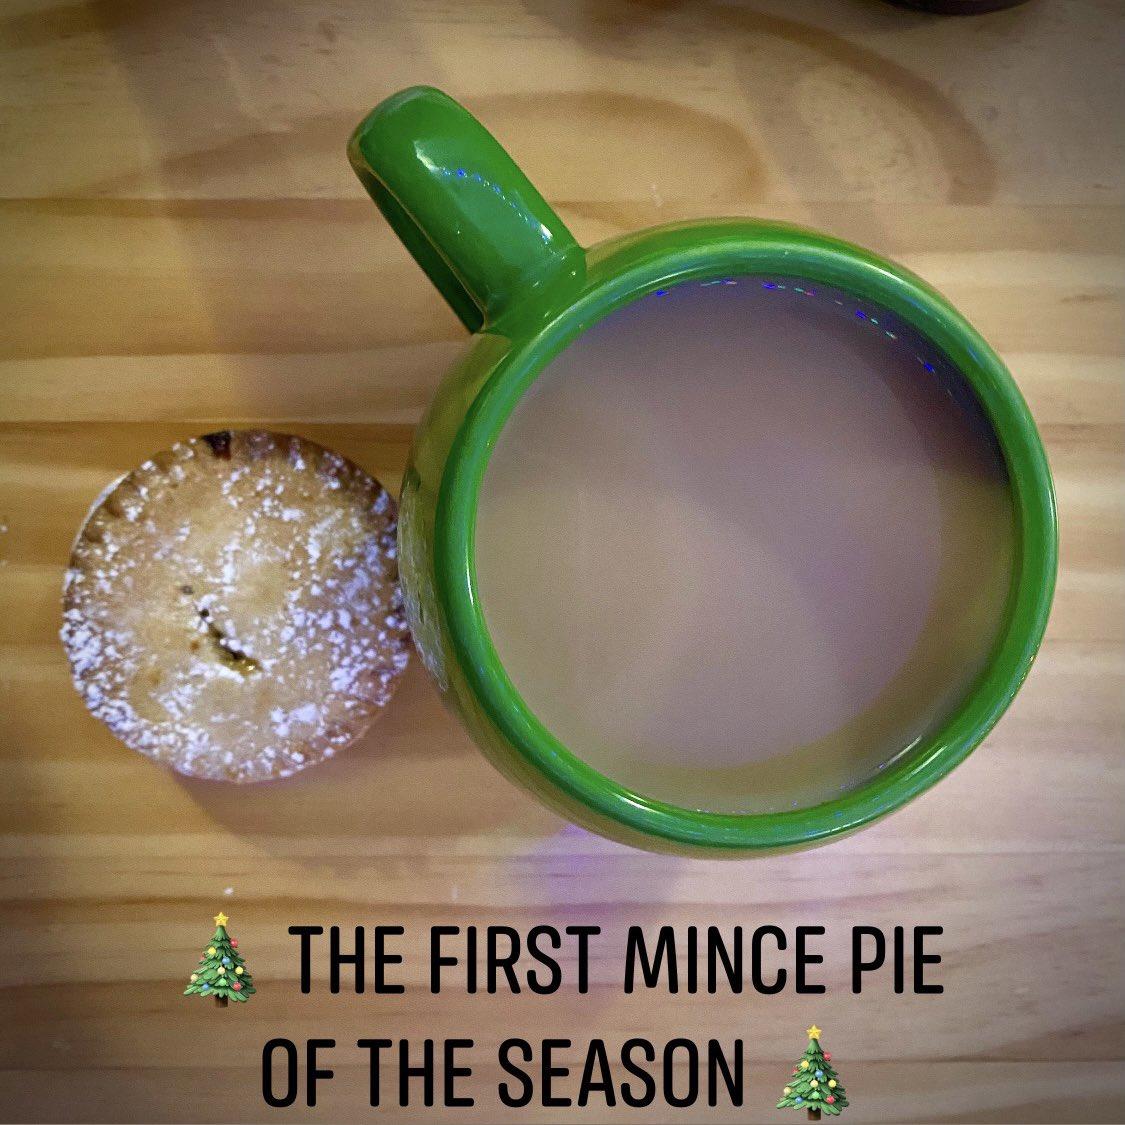 Yum . . #mincepies #mincepie #mincepieseason #cupoftea #cupofteatime #cupoftea☕️ #englishbreakfast #englishbreakfasttea #christmas #christmasiscoming #festive #festivevibes #festiveseason #yum #yummy